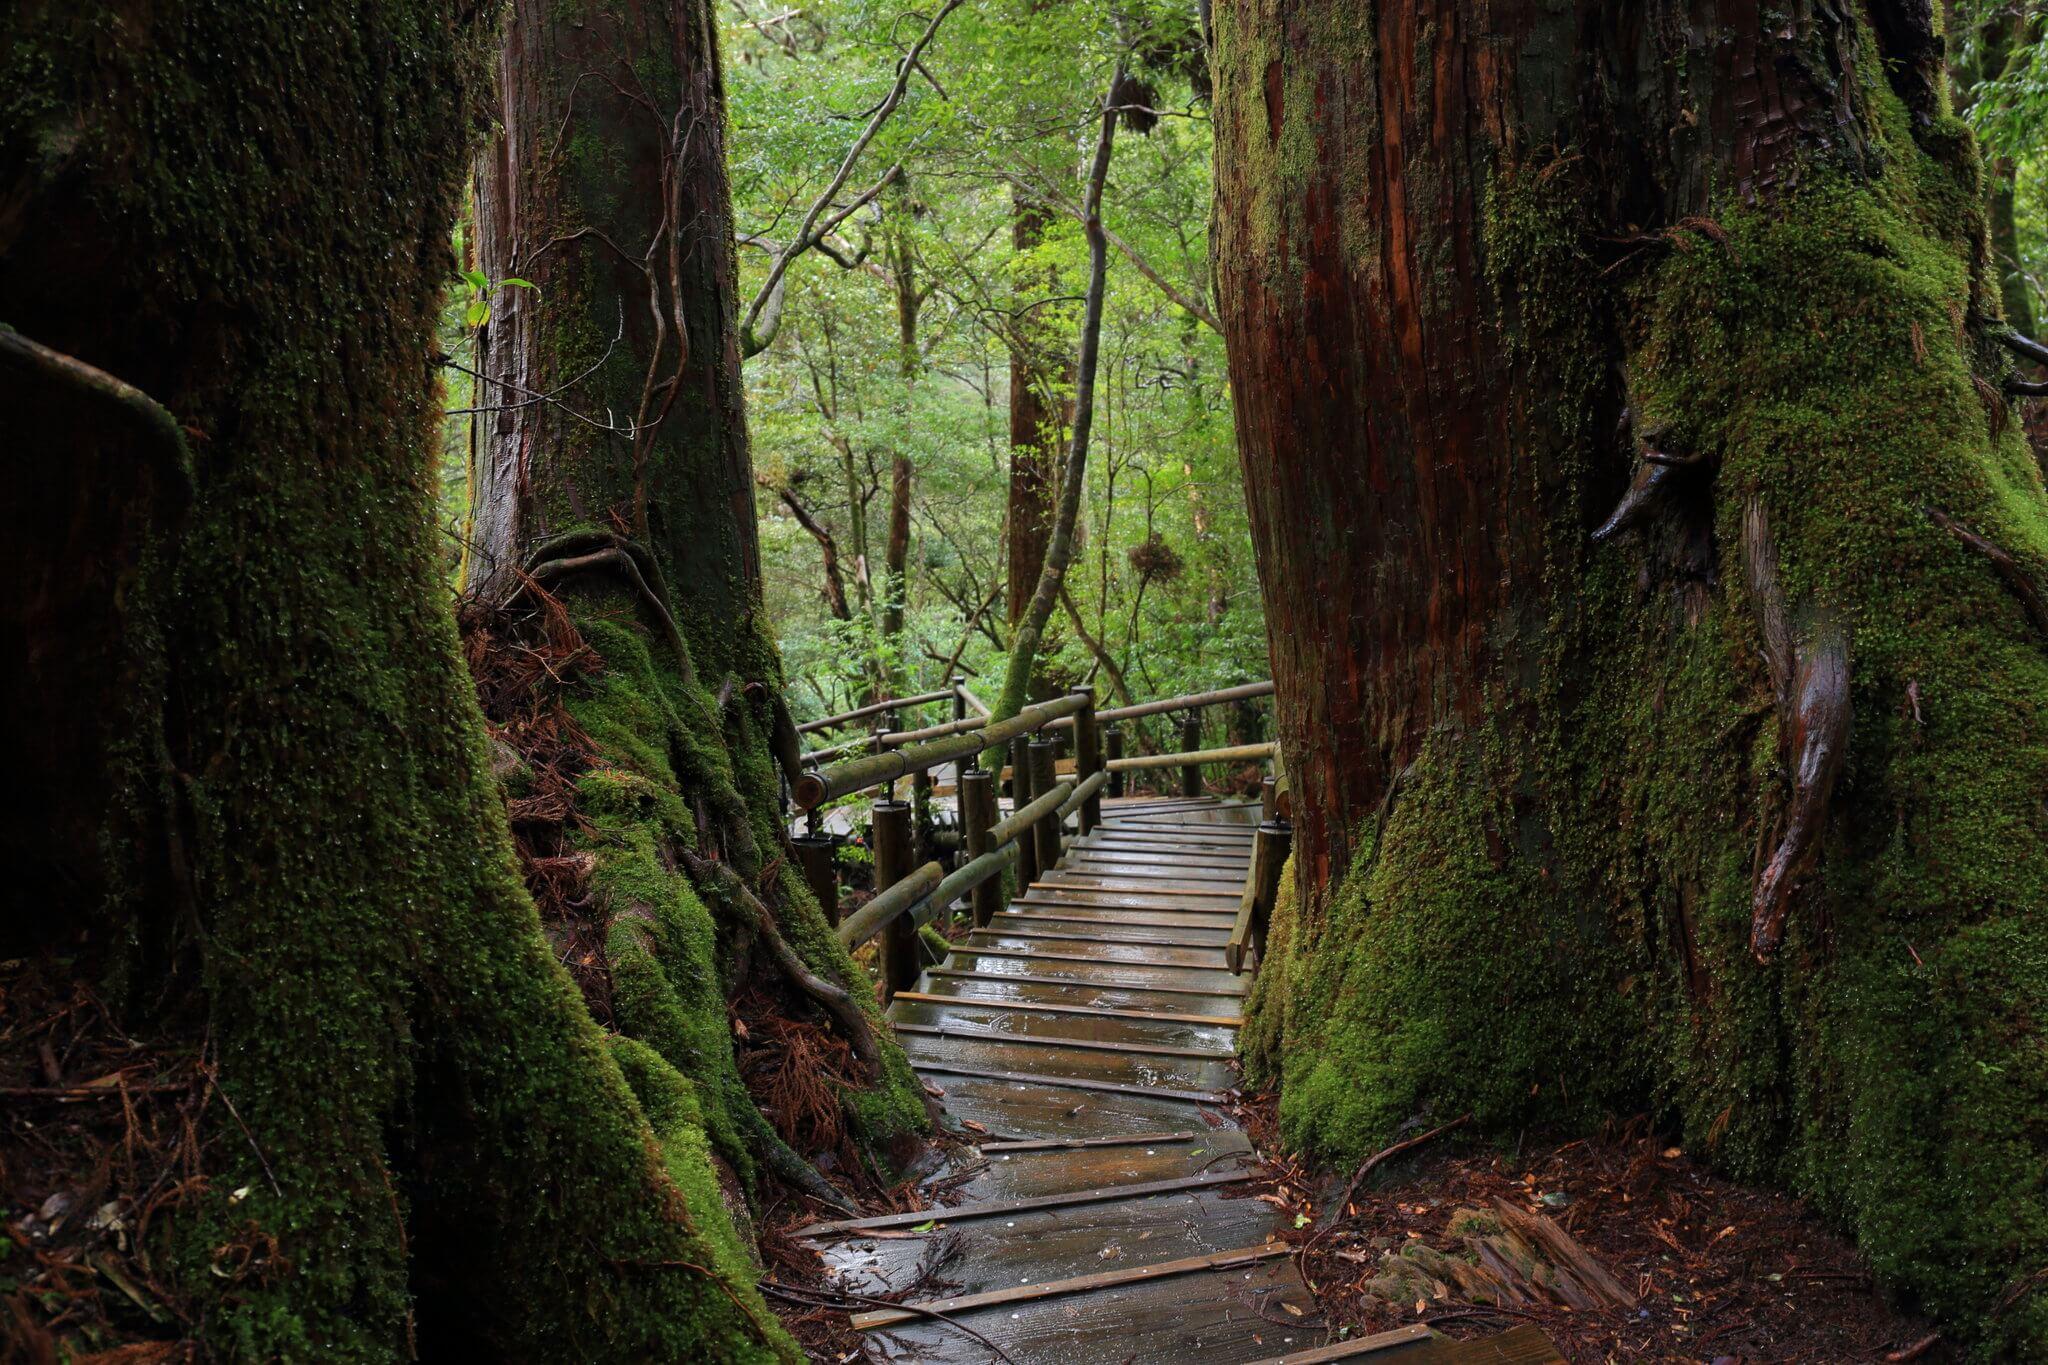 Japón a tu Aire - Escapada a Isla Yakushima: Pura Naturaleza